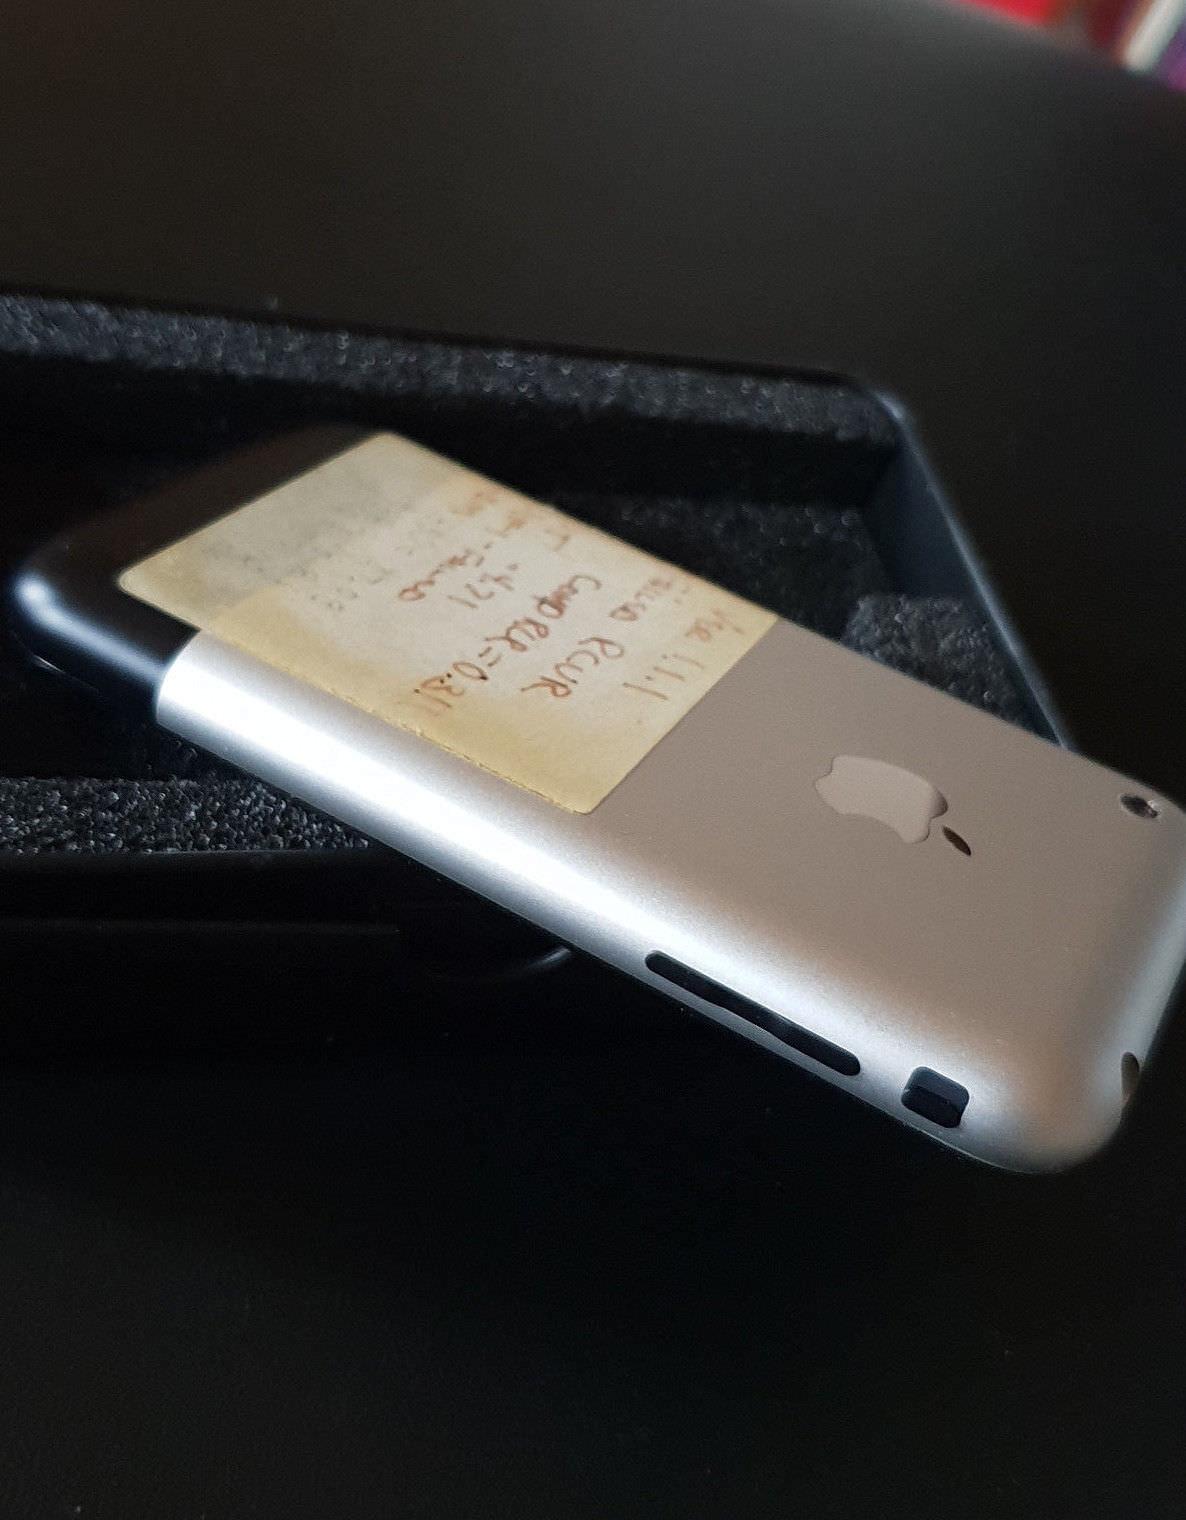 Prototype-Original-iPhone-on-ebay-2-3.jpg